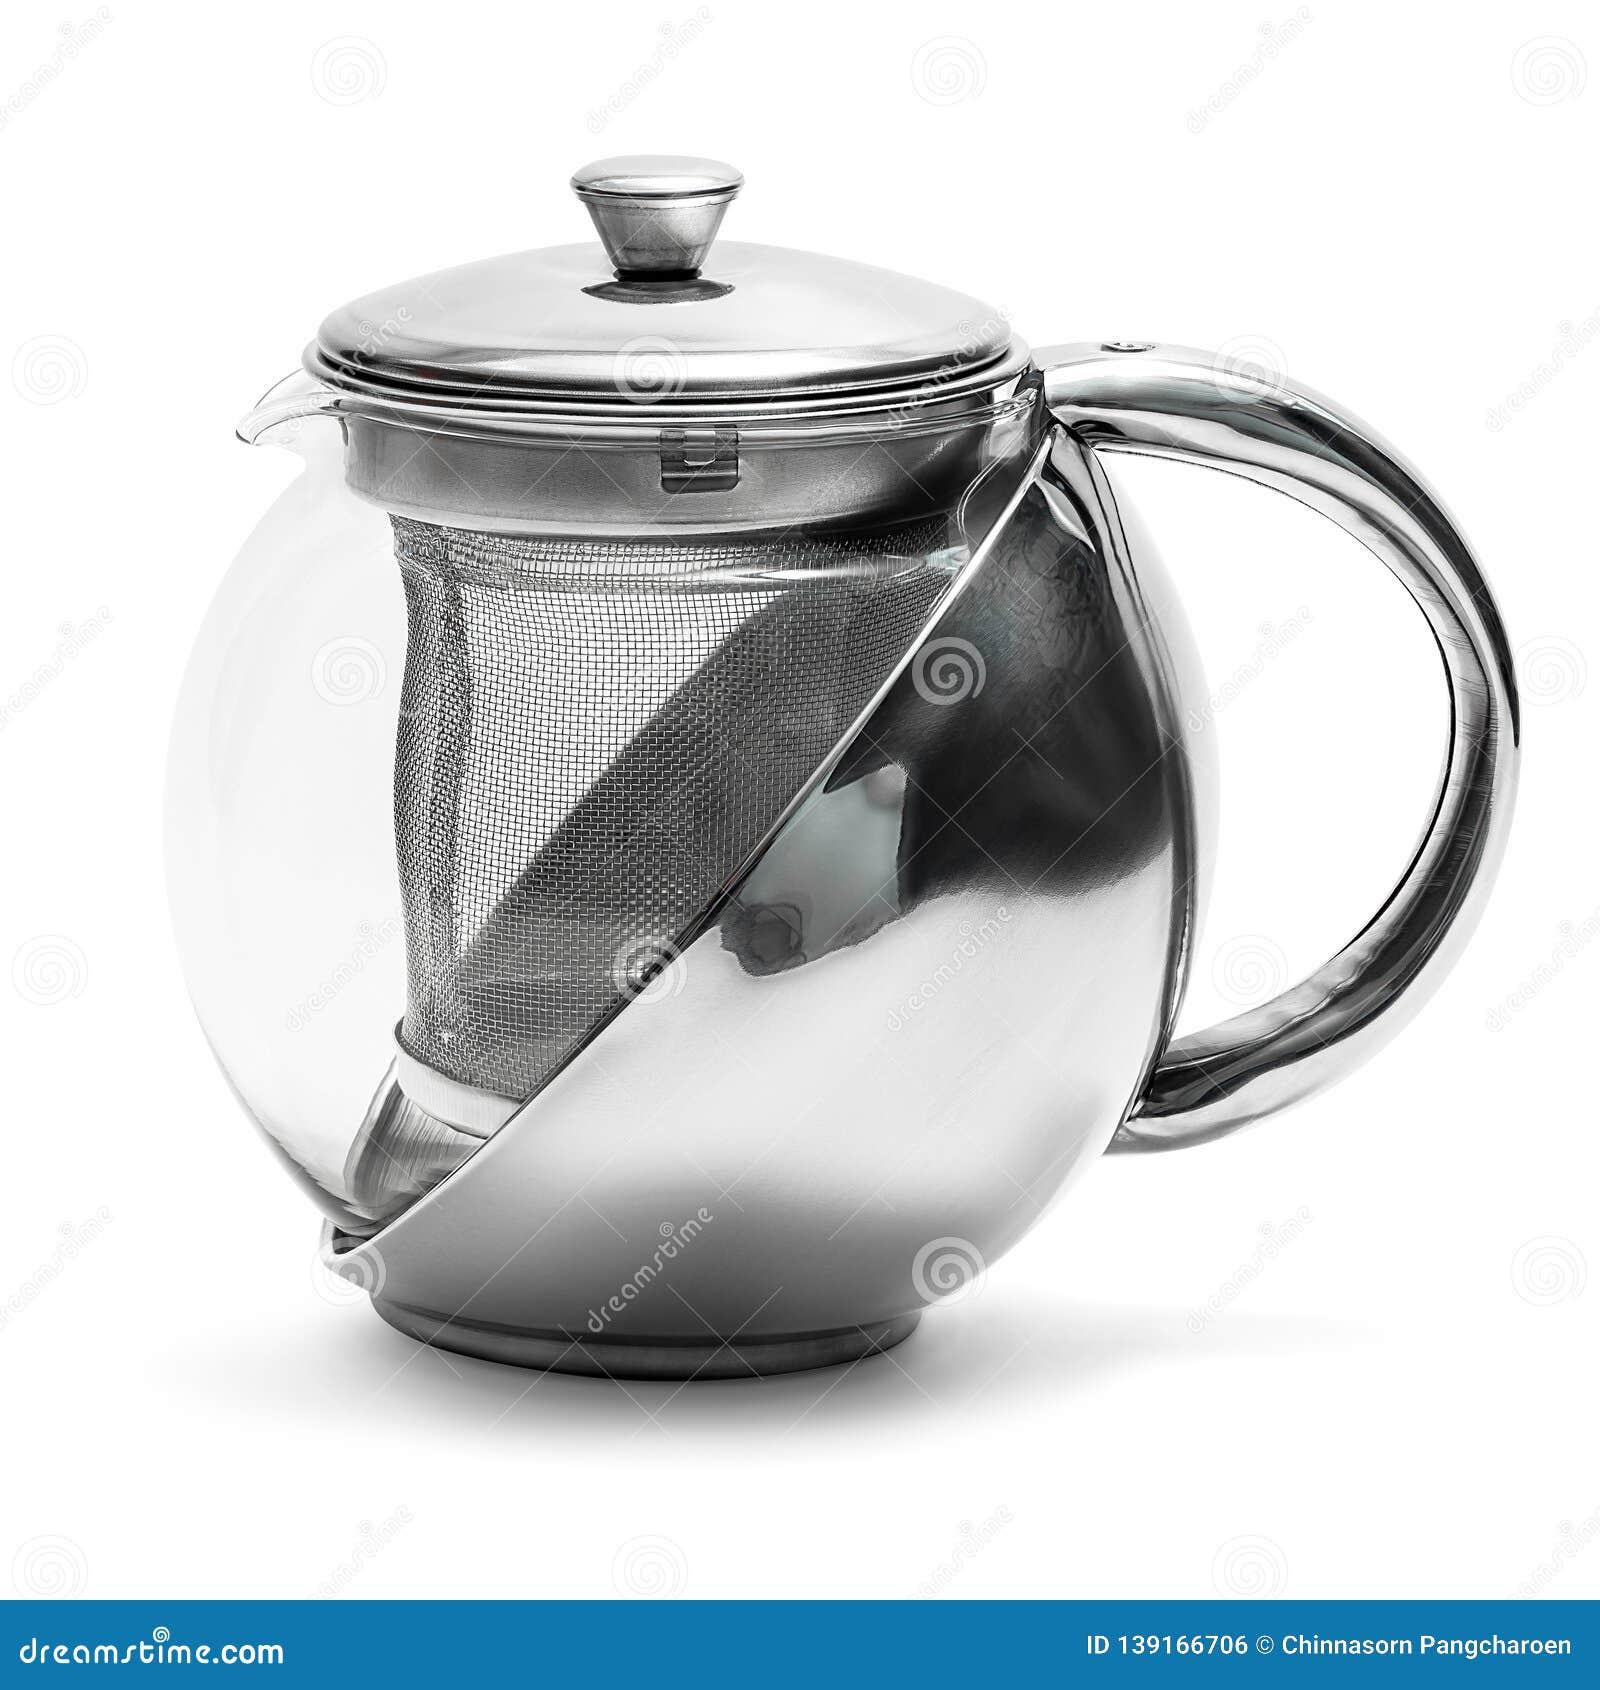 Tea kettle isolated